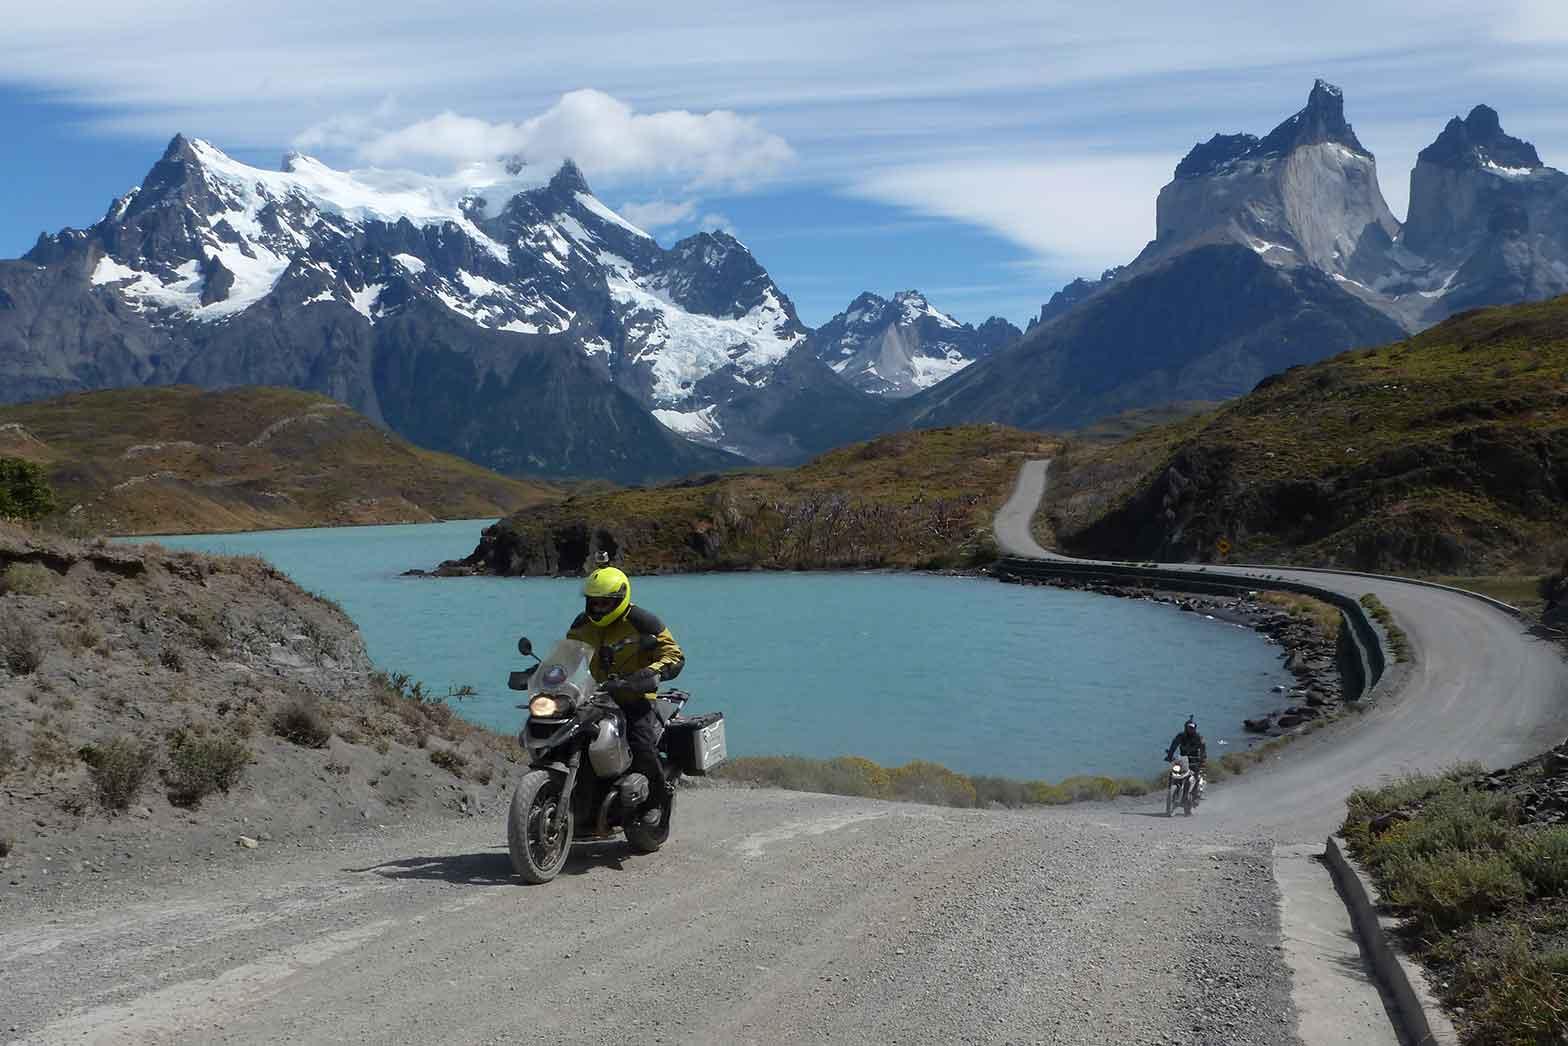 Leaving Torres del Paine